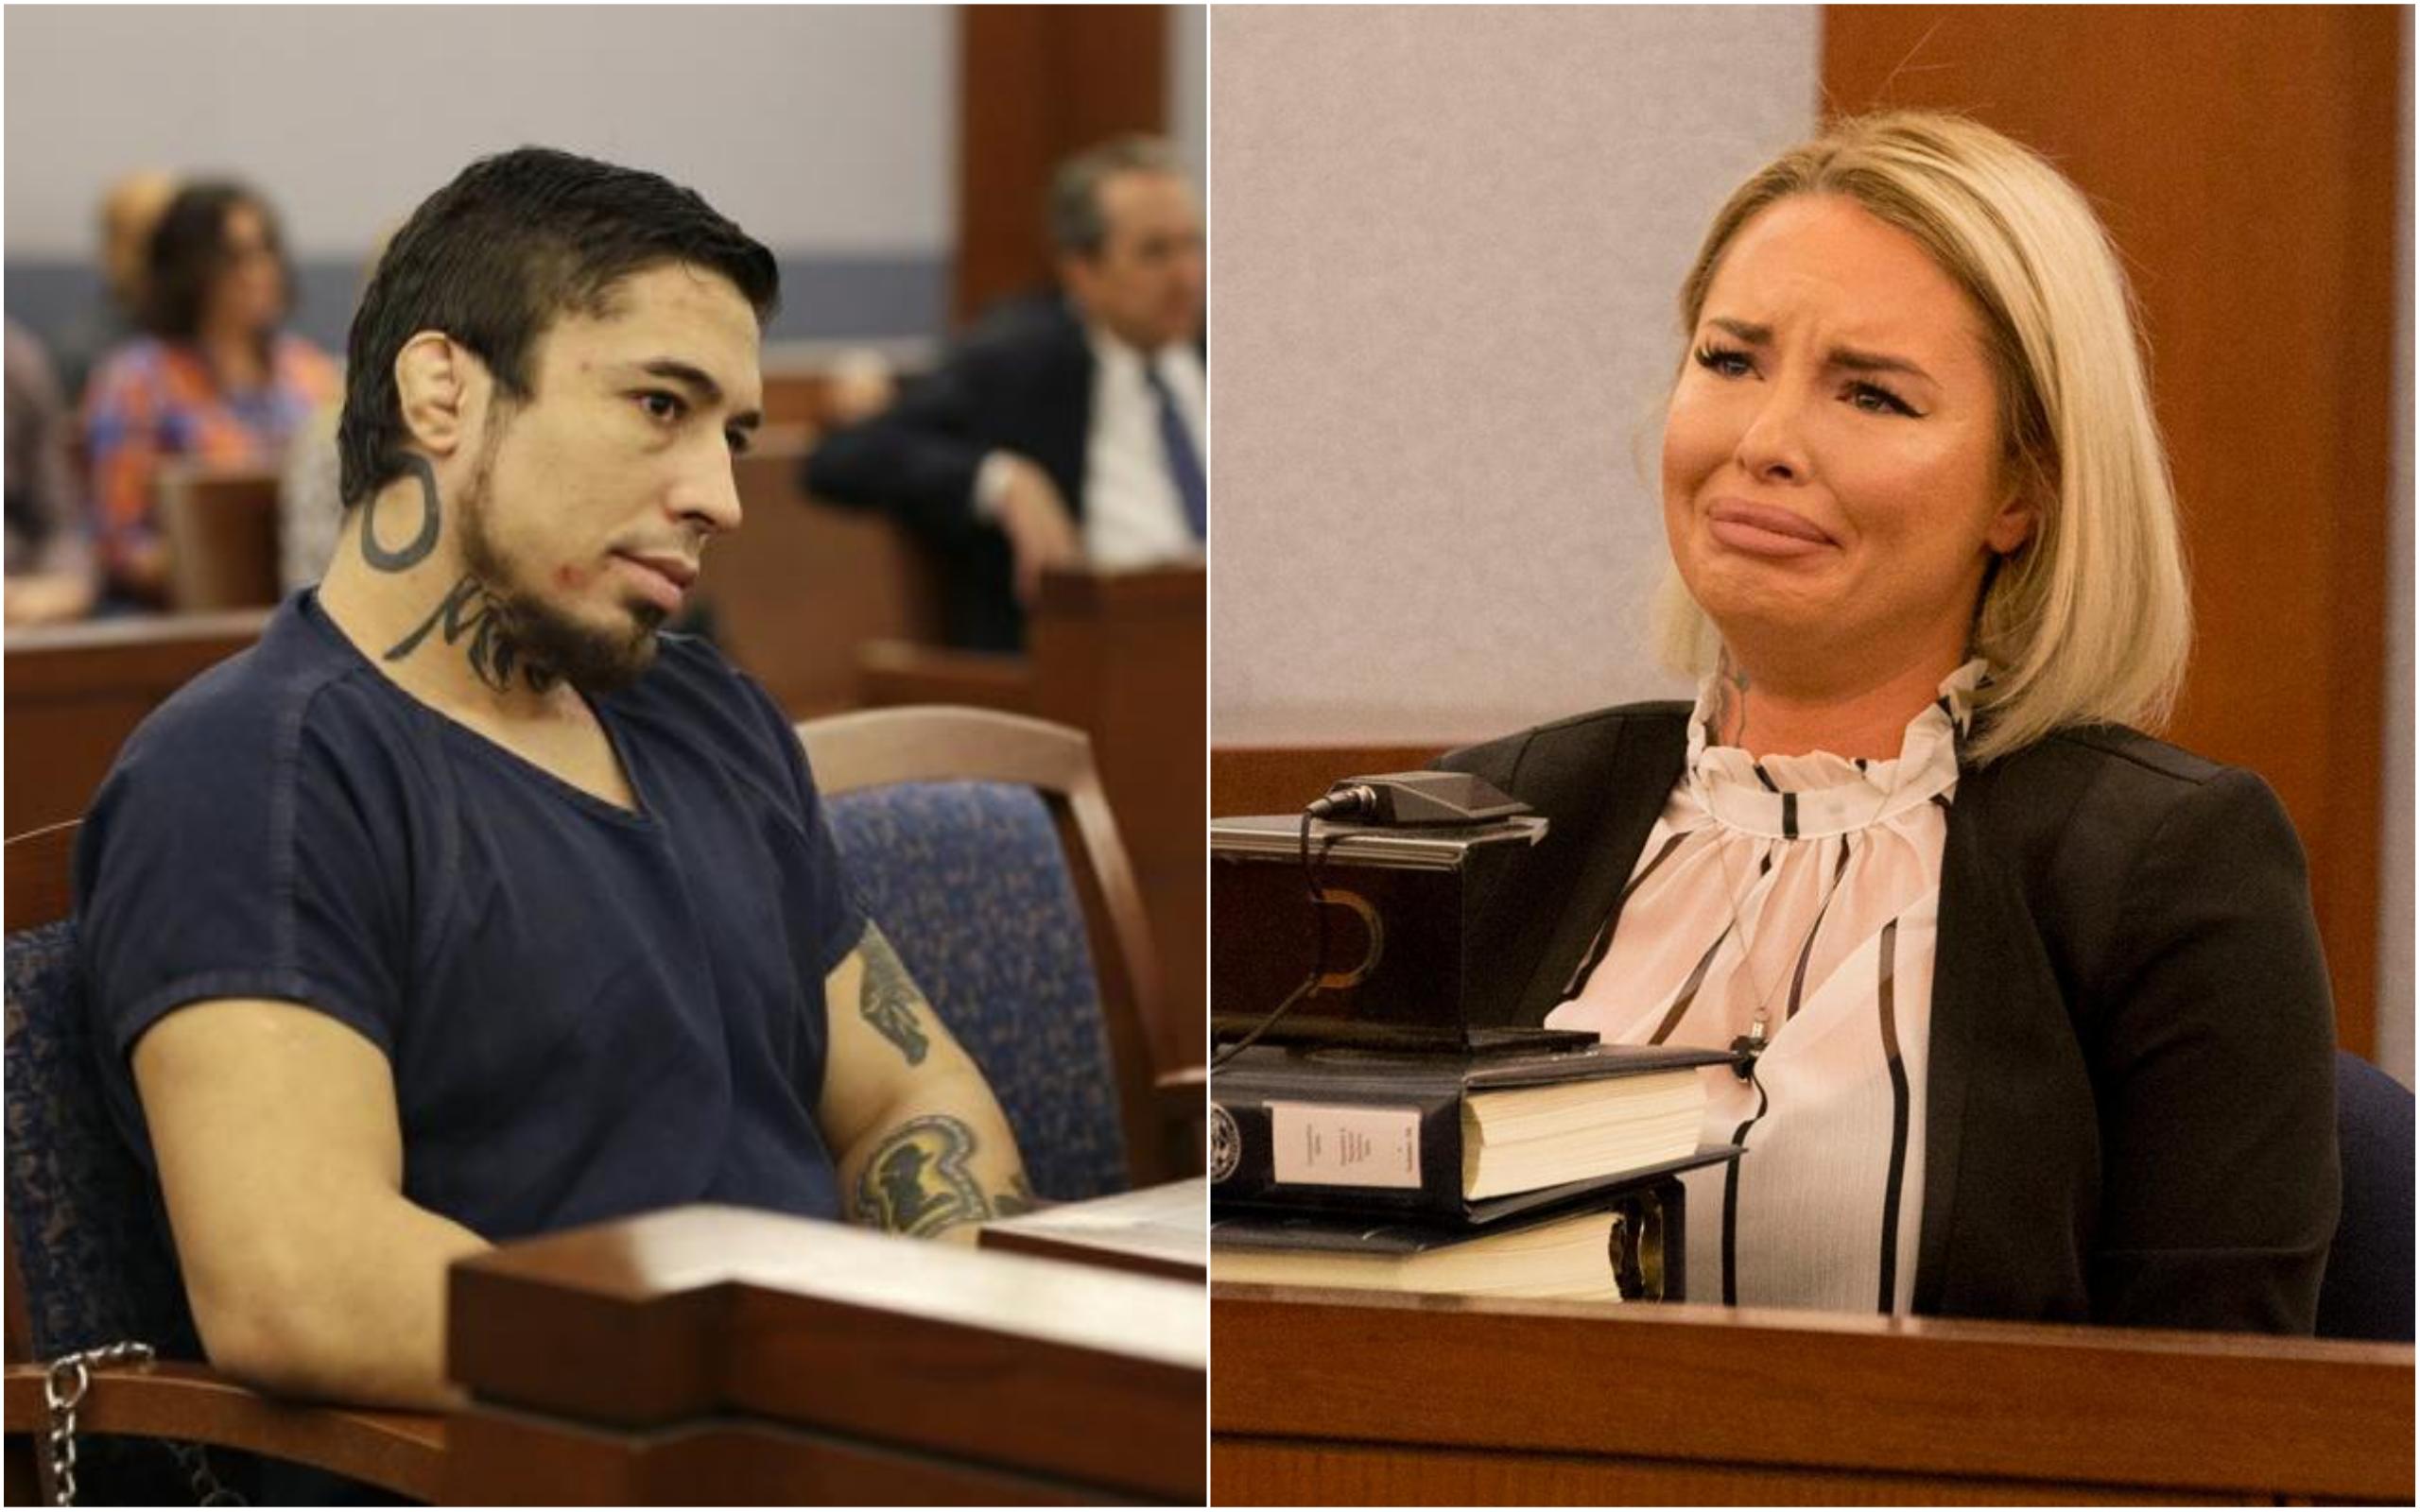 Dan cadena perpetua a luchador de MMA que golpeó a estrella porno